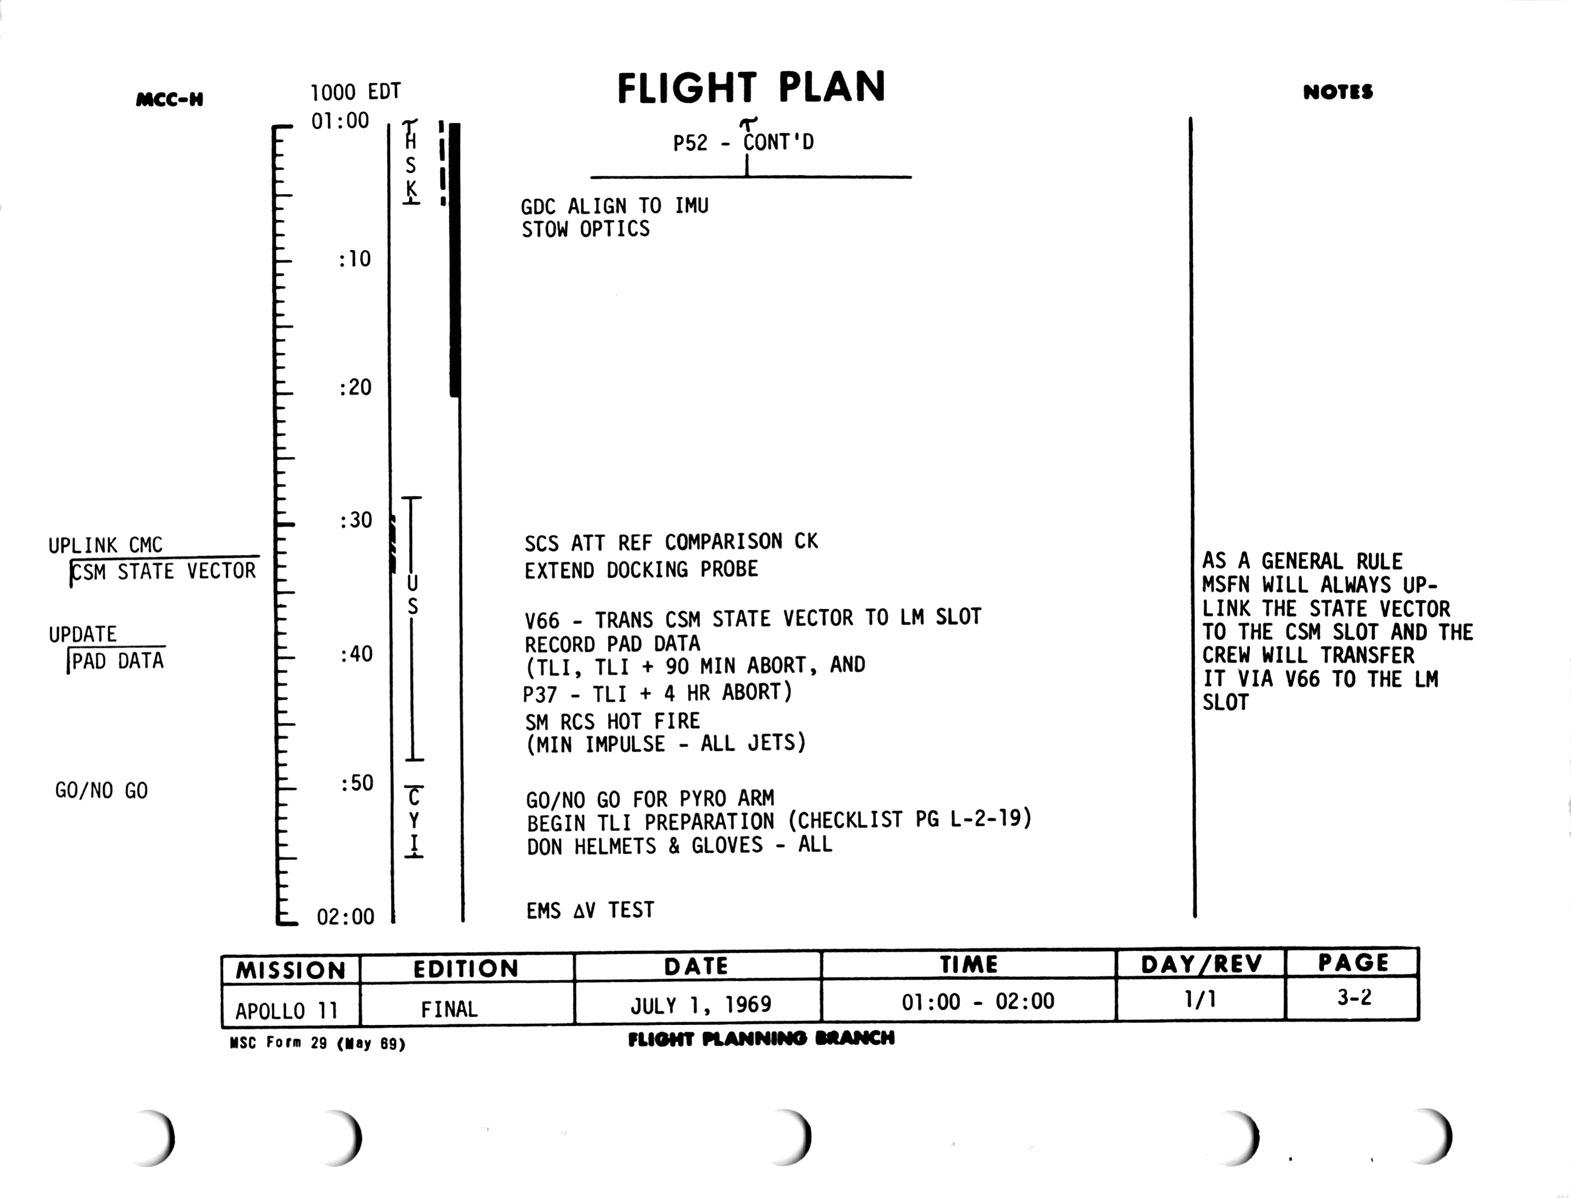 Apollo 11 Flight Journal - Day 1, part 2: Earth Orbit and Translunar